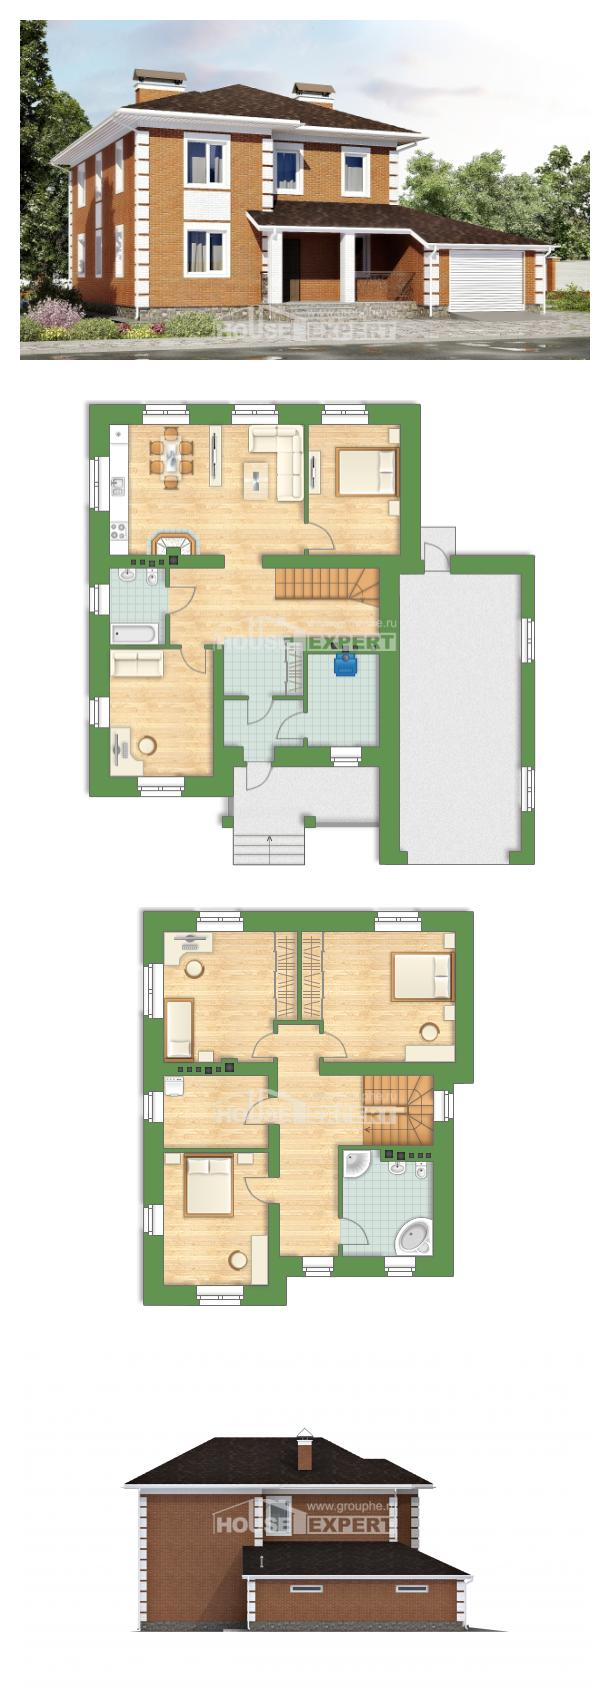 Proyecto de casa 220-004-L | House Expert